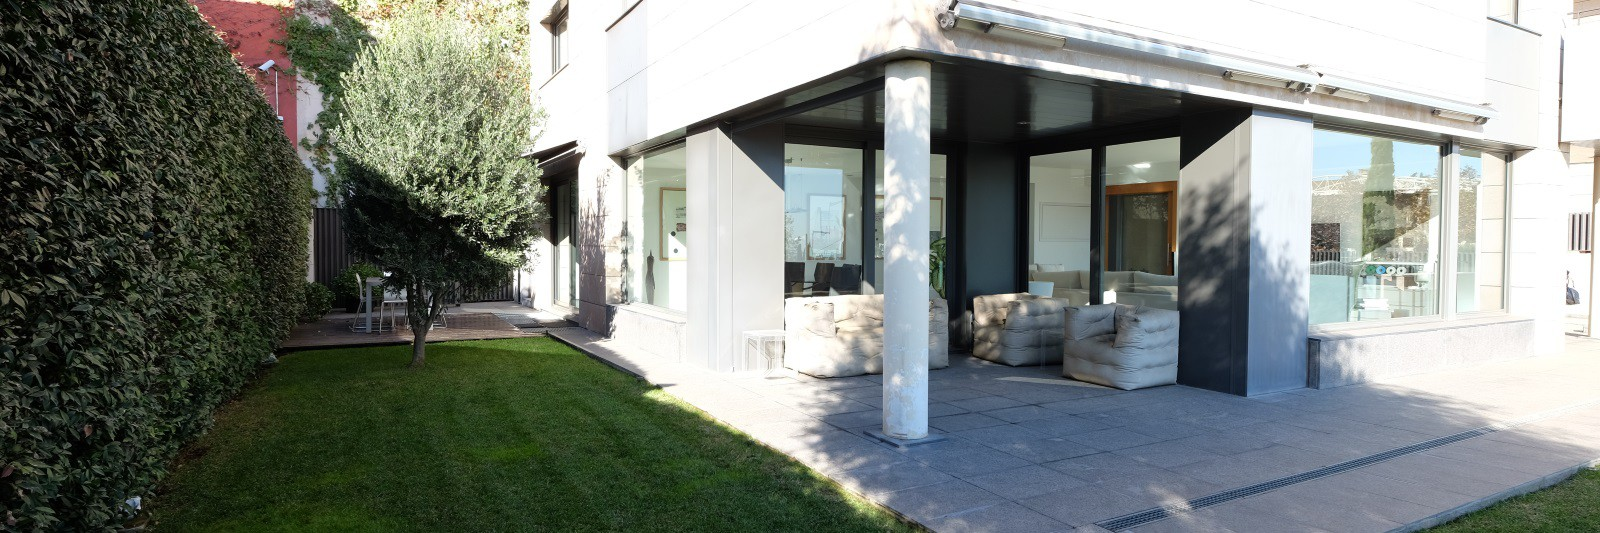 MG Inmobiliaria Barcelona - Casa-Iradier-Pedralbes